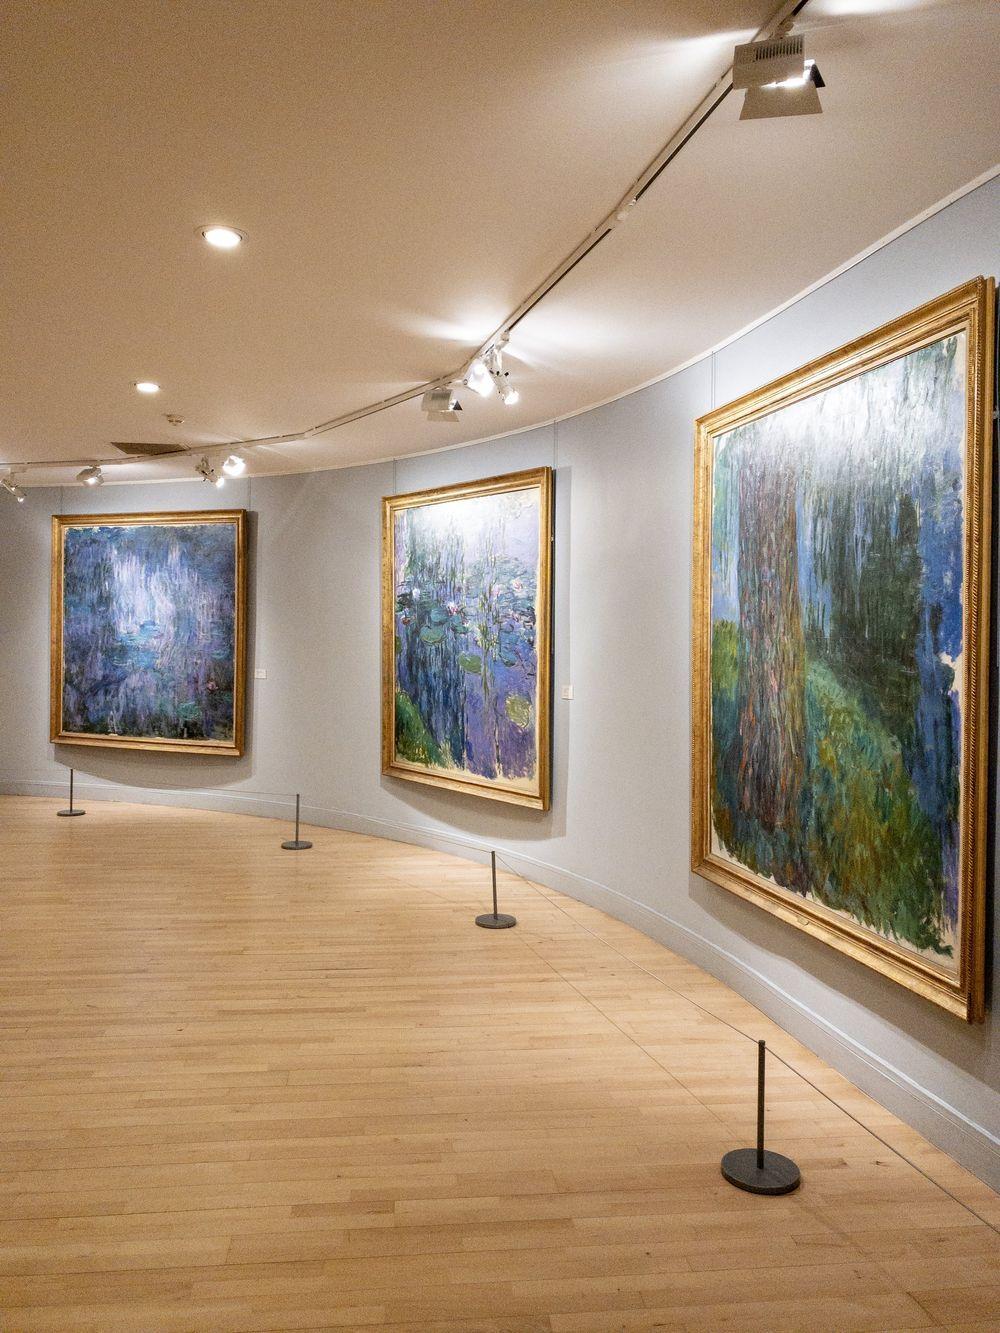 Musee Marmottan Monet - Claude Monet, Nymphéas, 1914-1917